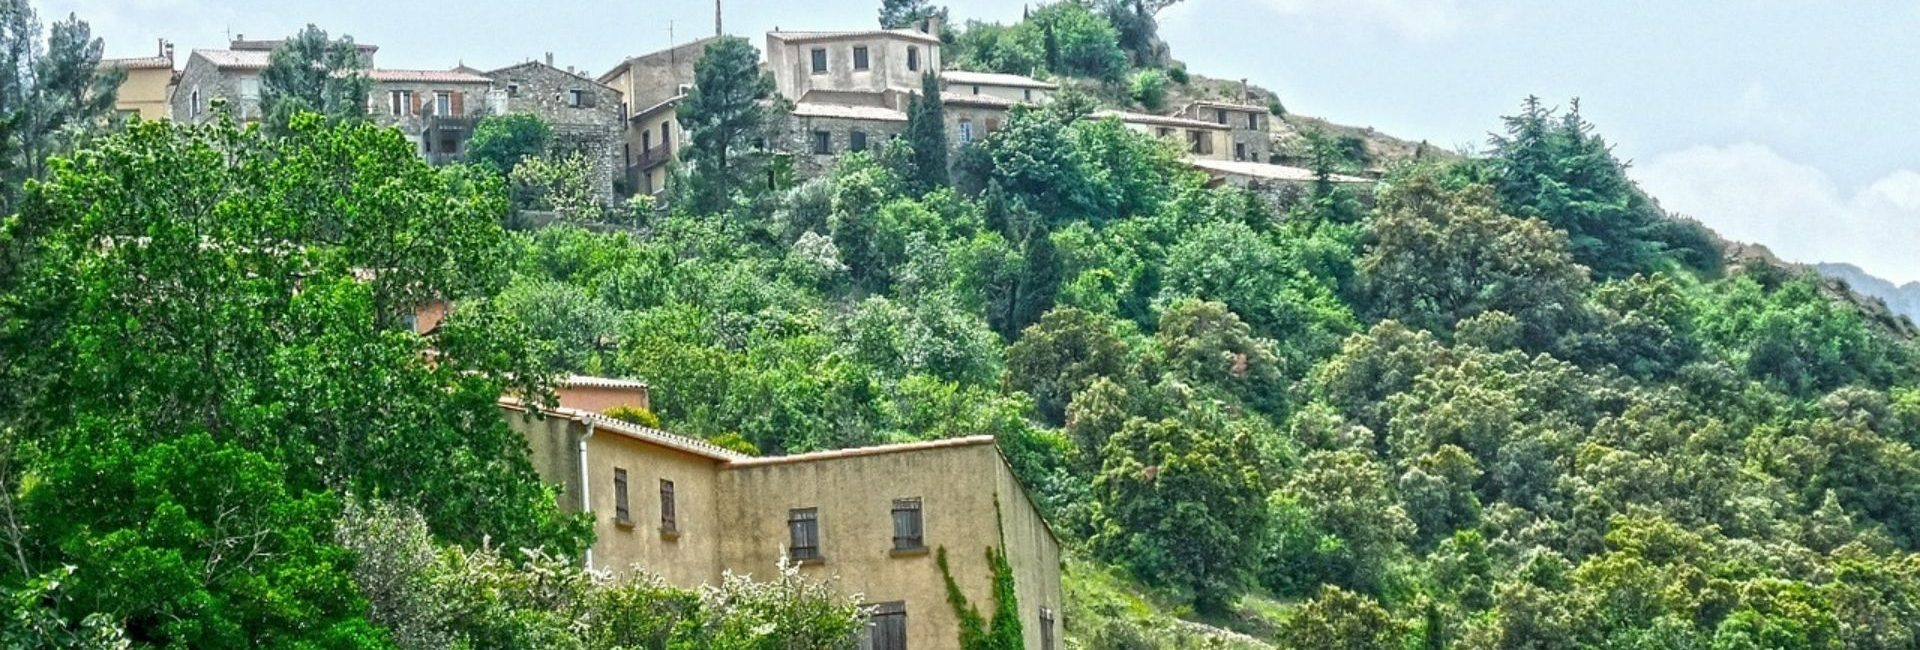 Domaine Sainte Véziane : Diaporama Cucugnan